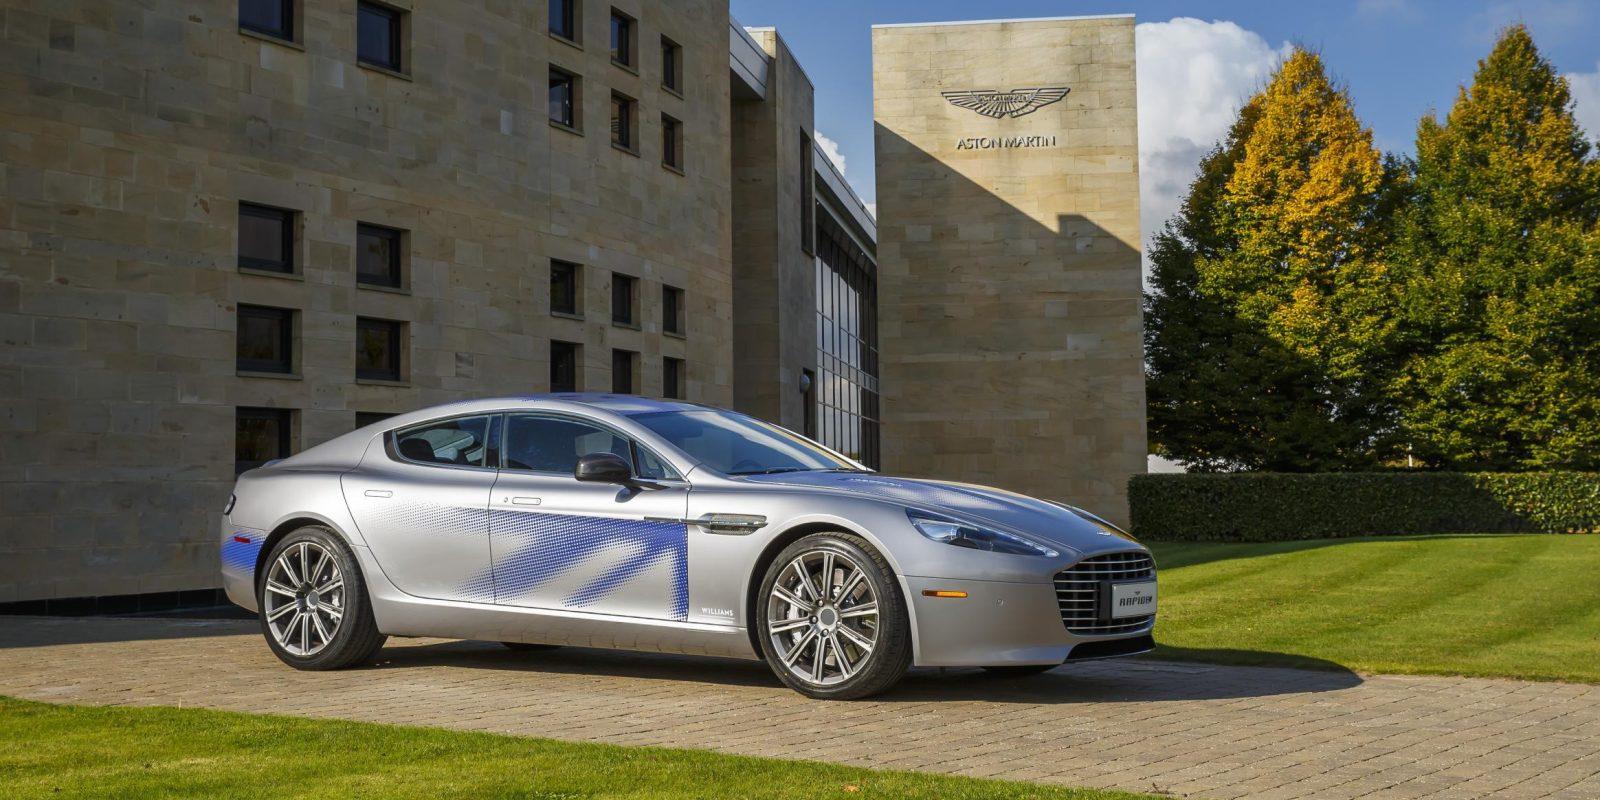 James Bond S Next Car Will Be The All Electric Aston Martin Rapide E